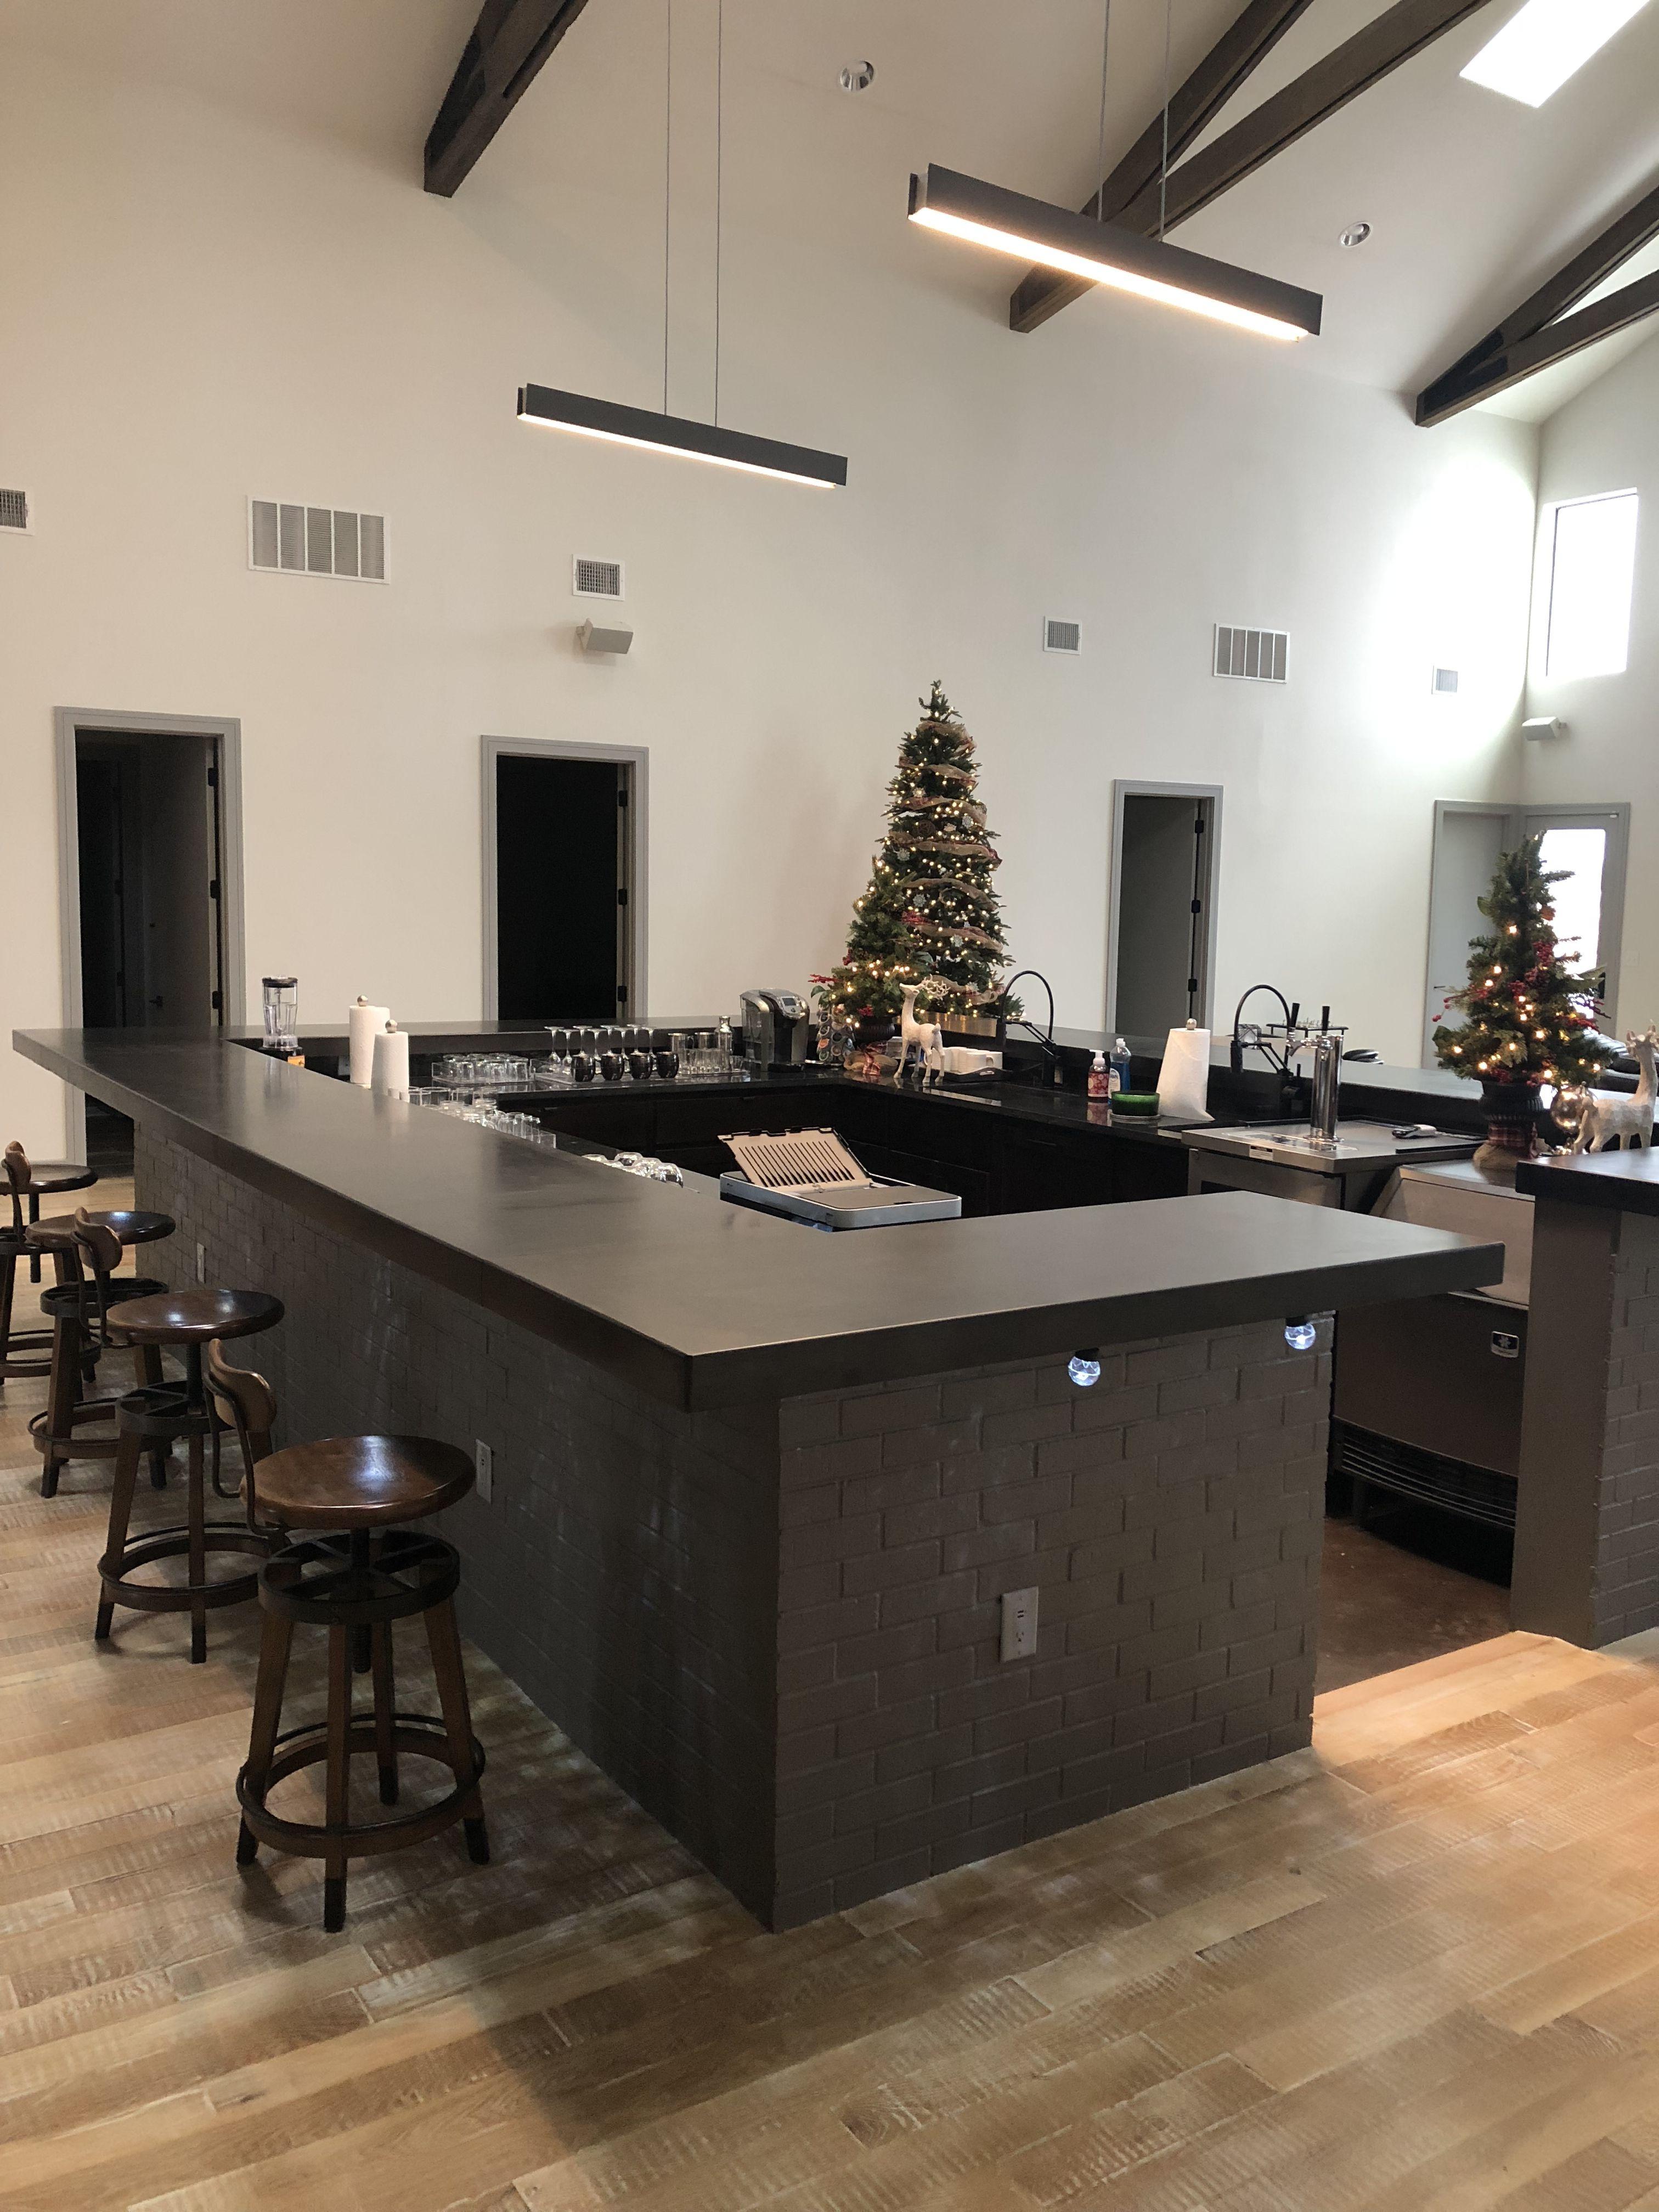 Wetbar Fullbar Whiskey Bar Homebar Barndo Concrete